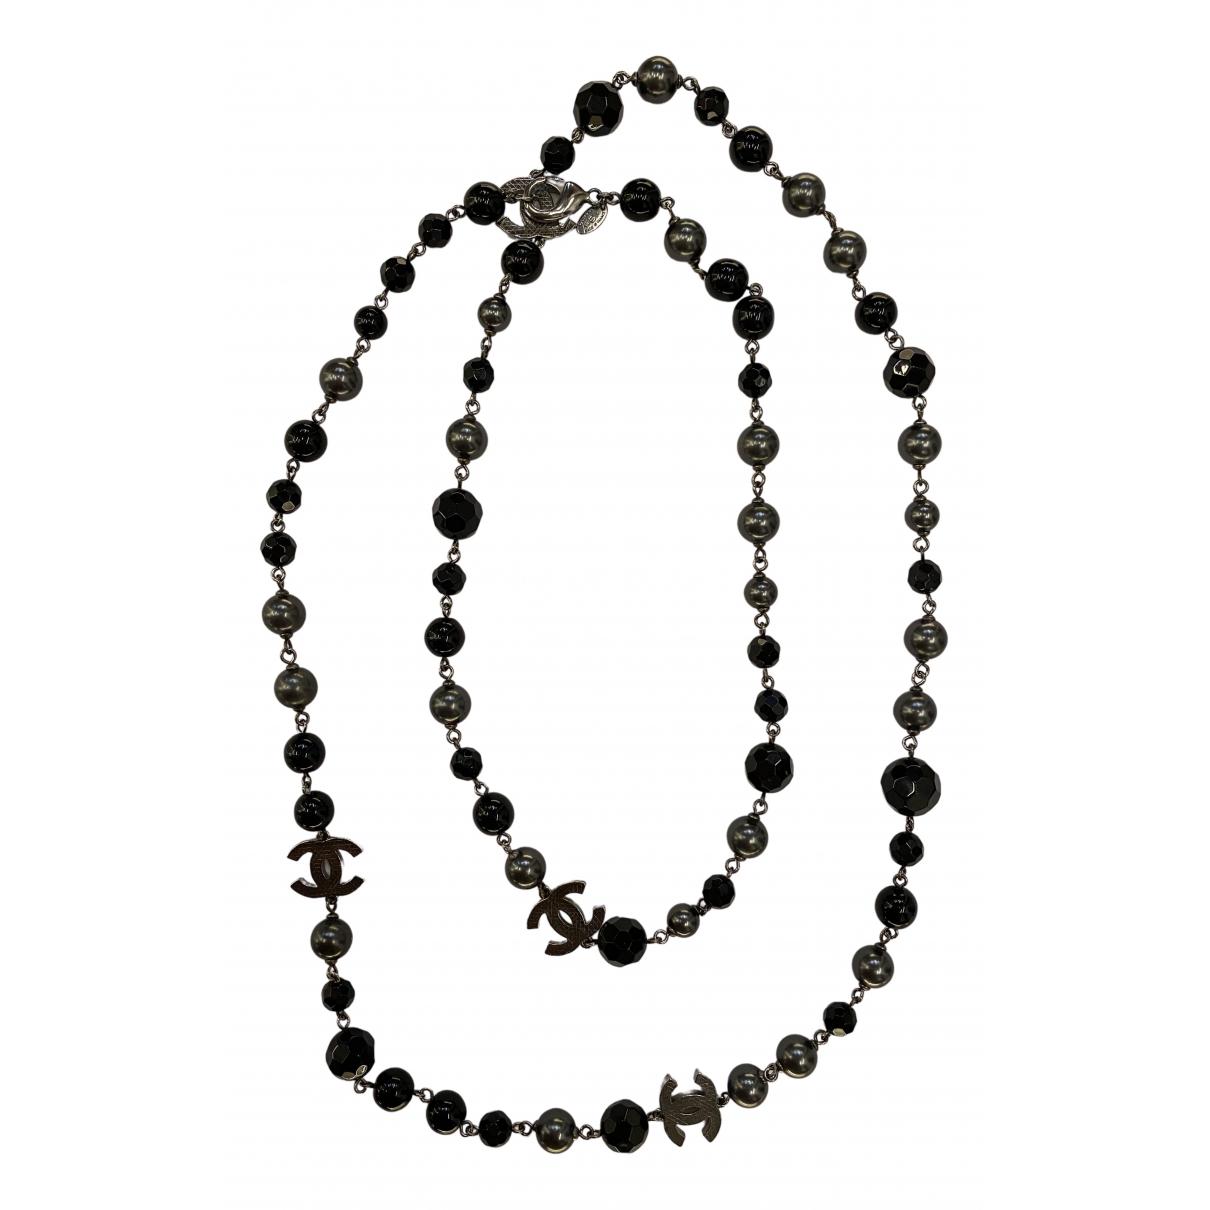 Chanel CC Kette in  Schwarz Perlen